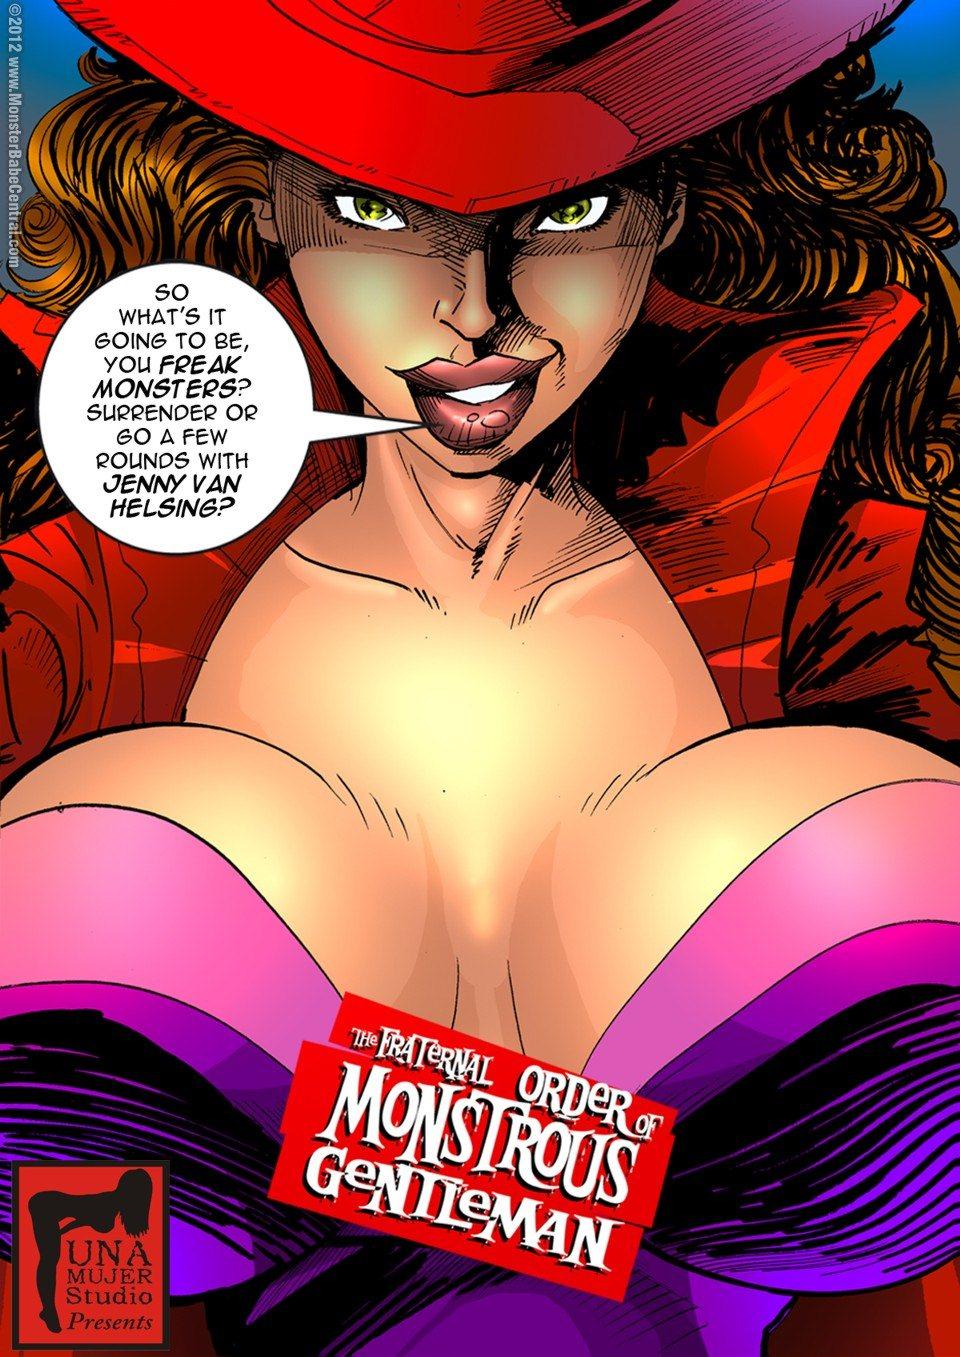 Porn Comics - Monstrous Gentlemen 7 porn comics 8 muses